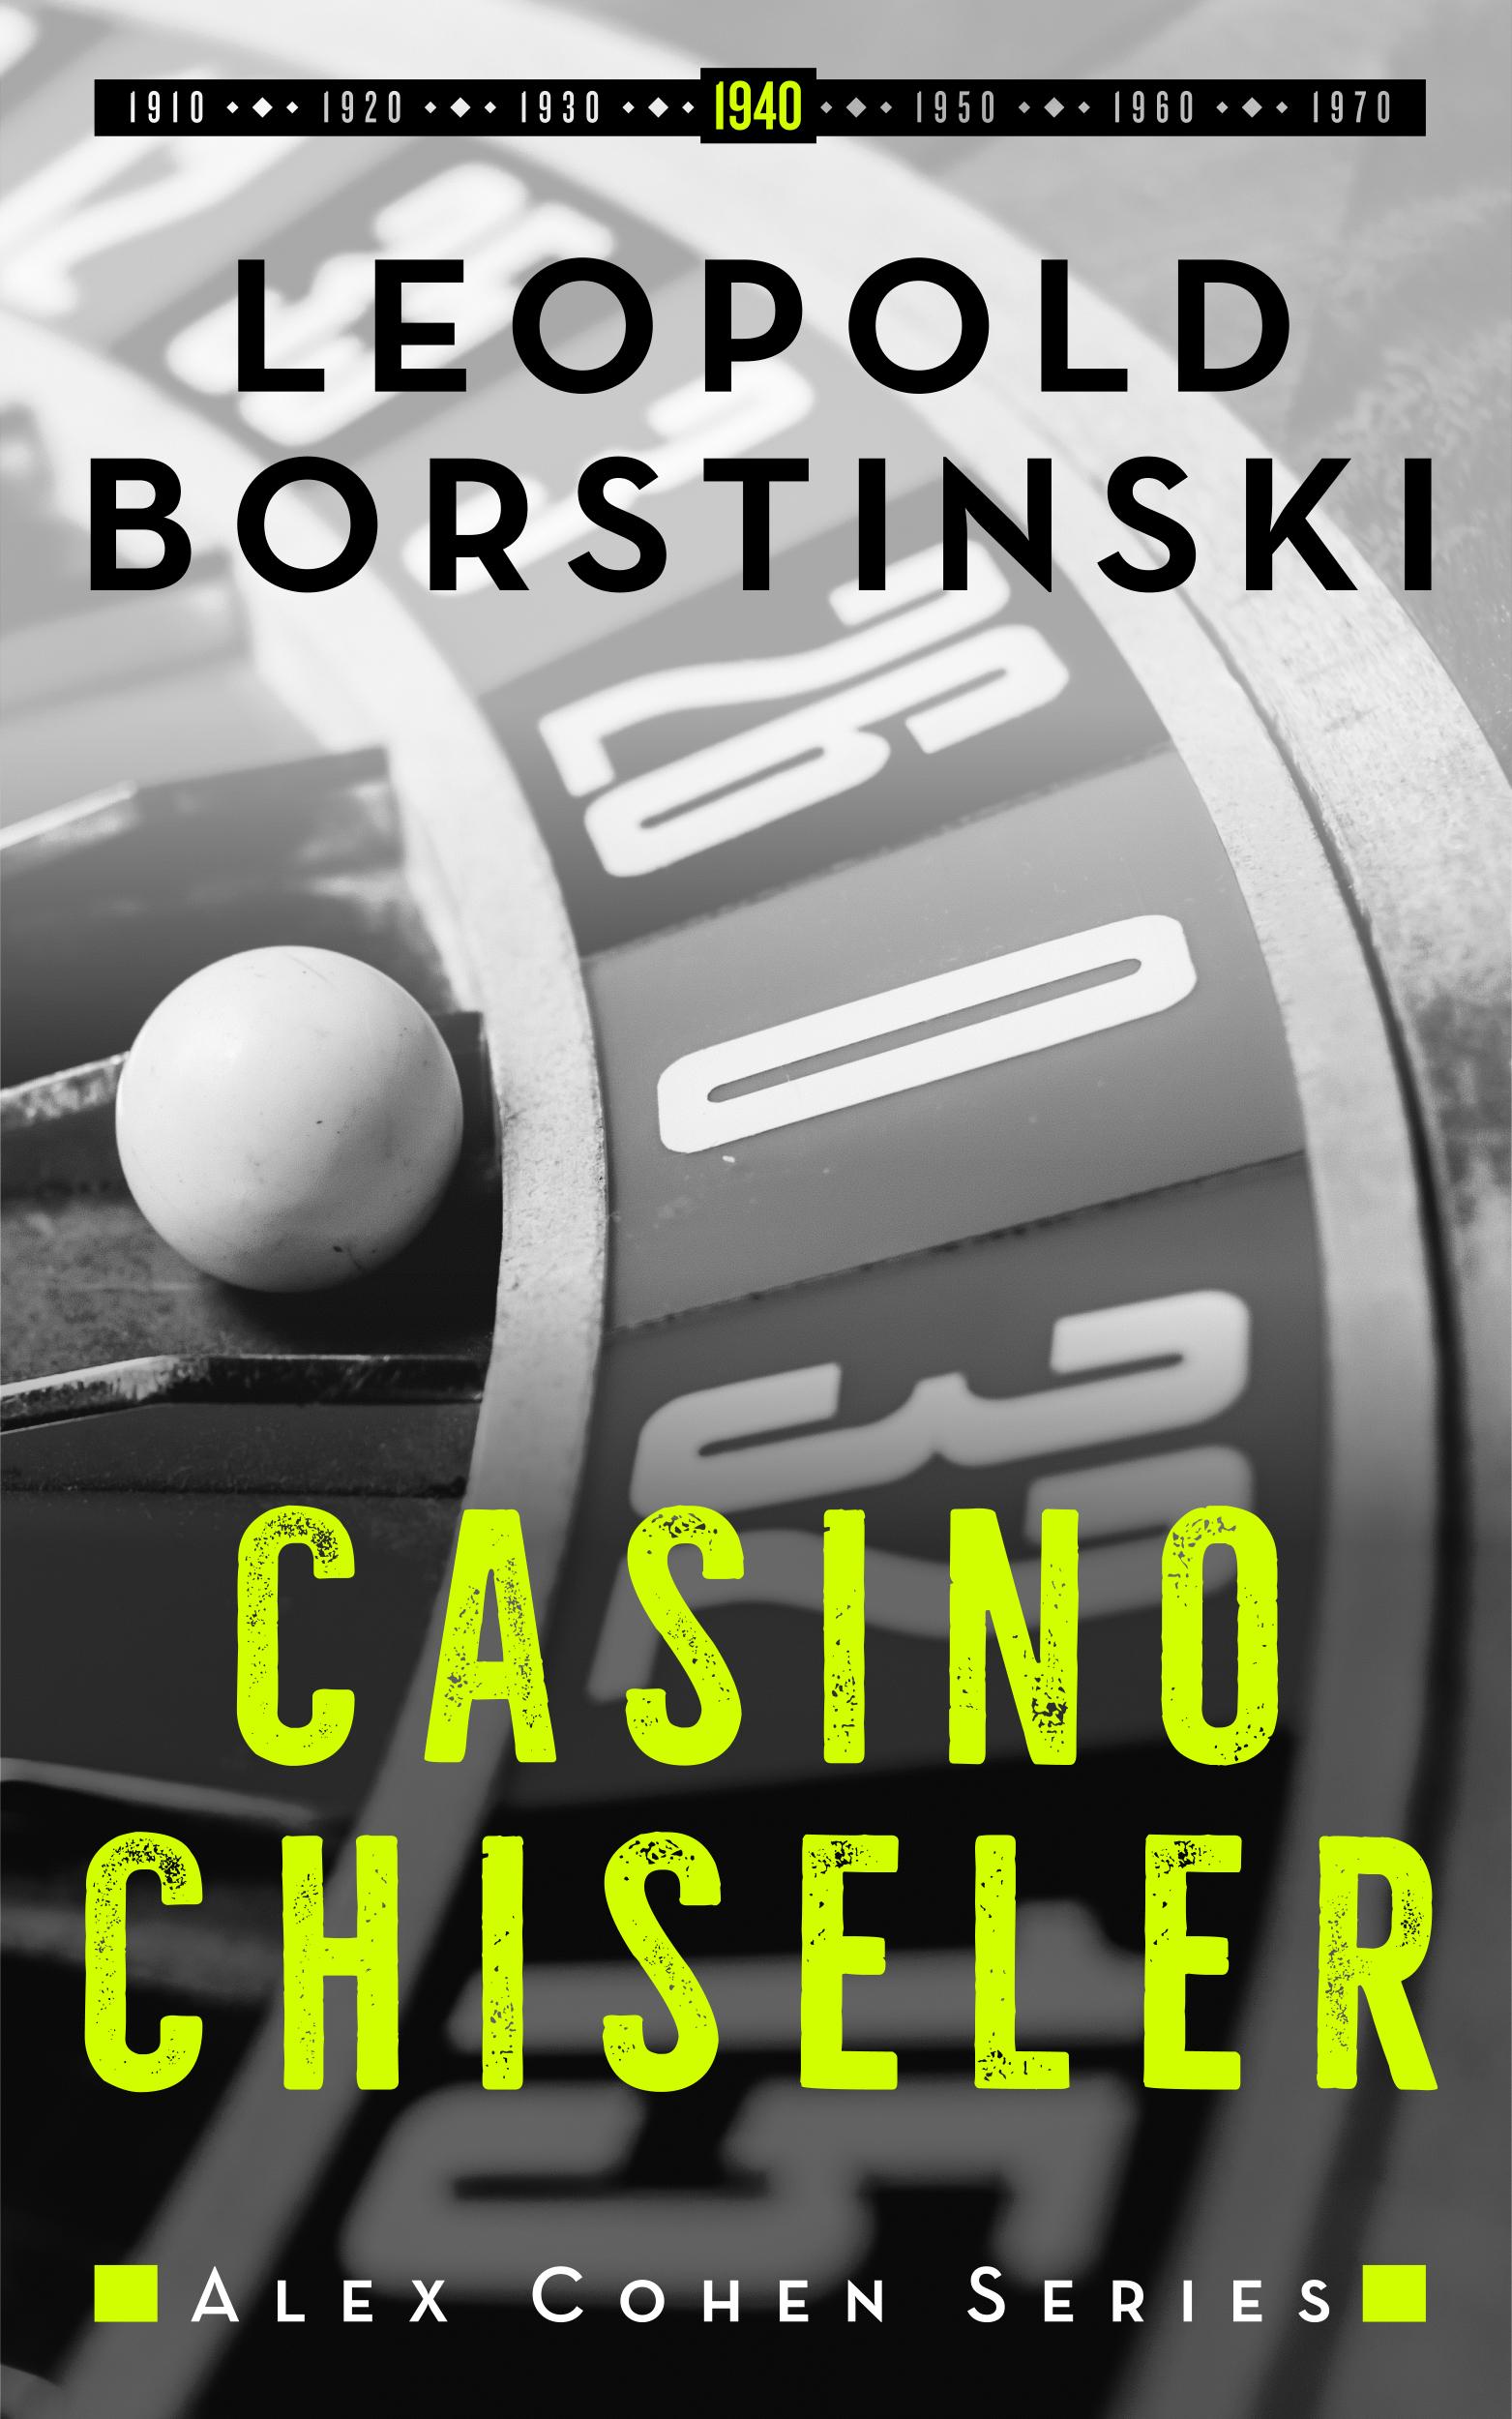 4 Casino Chiseler High Res 1940